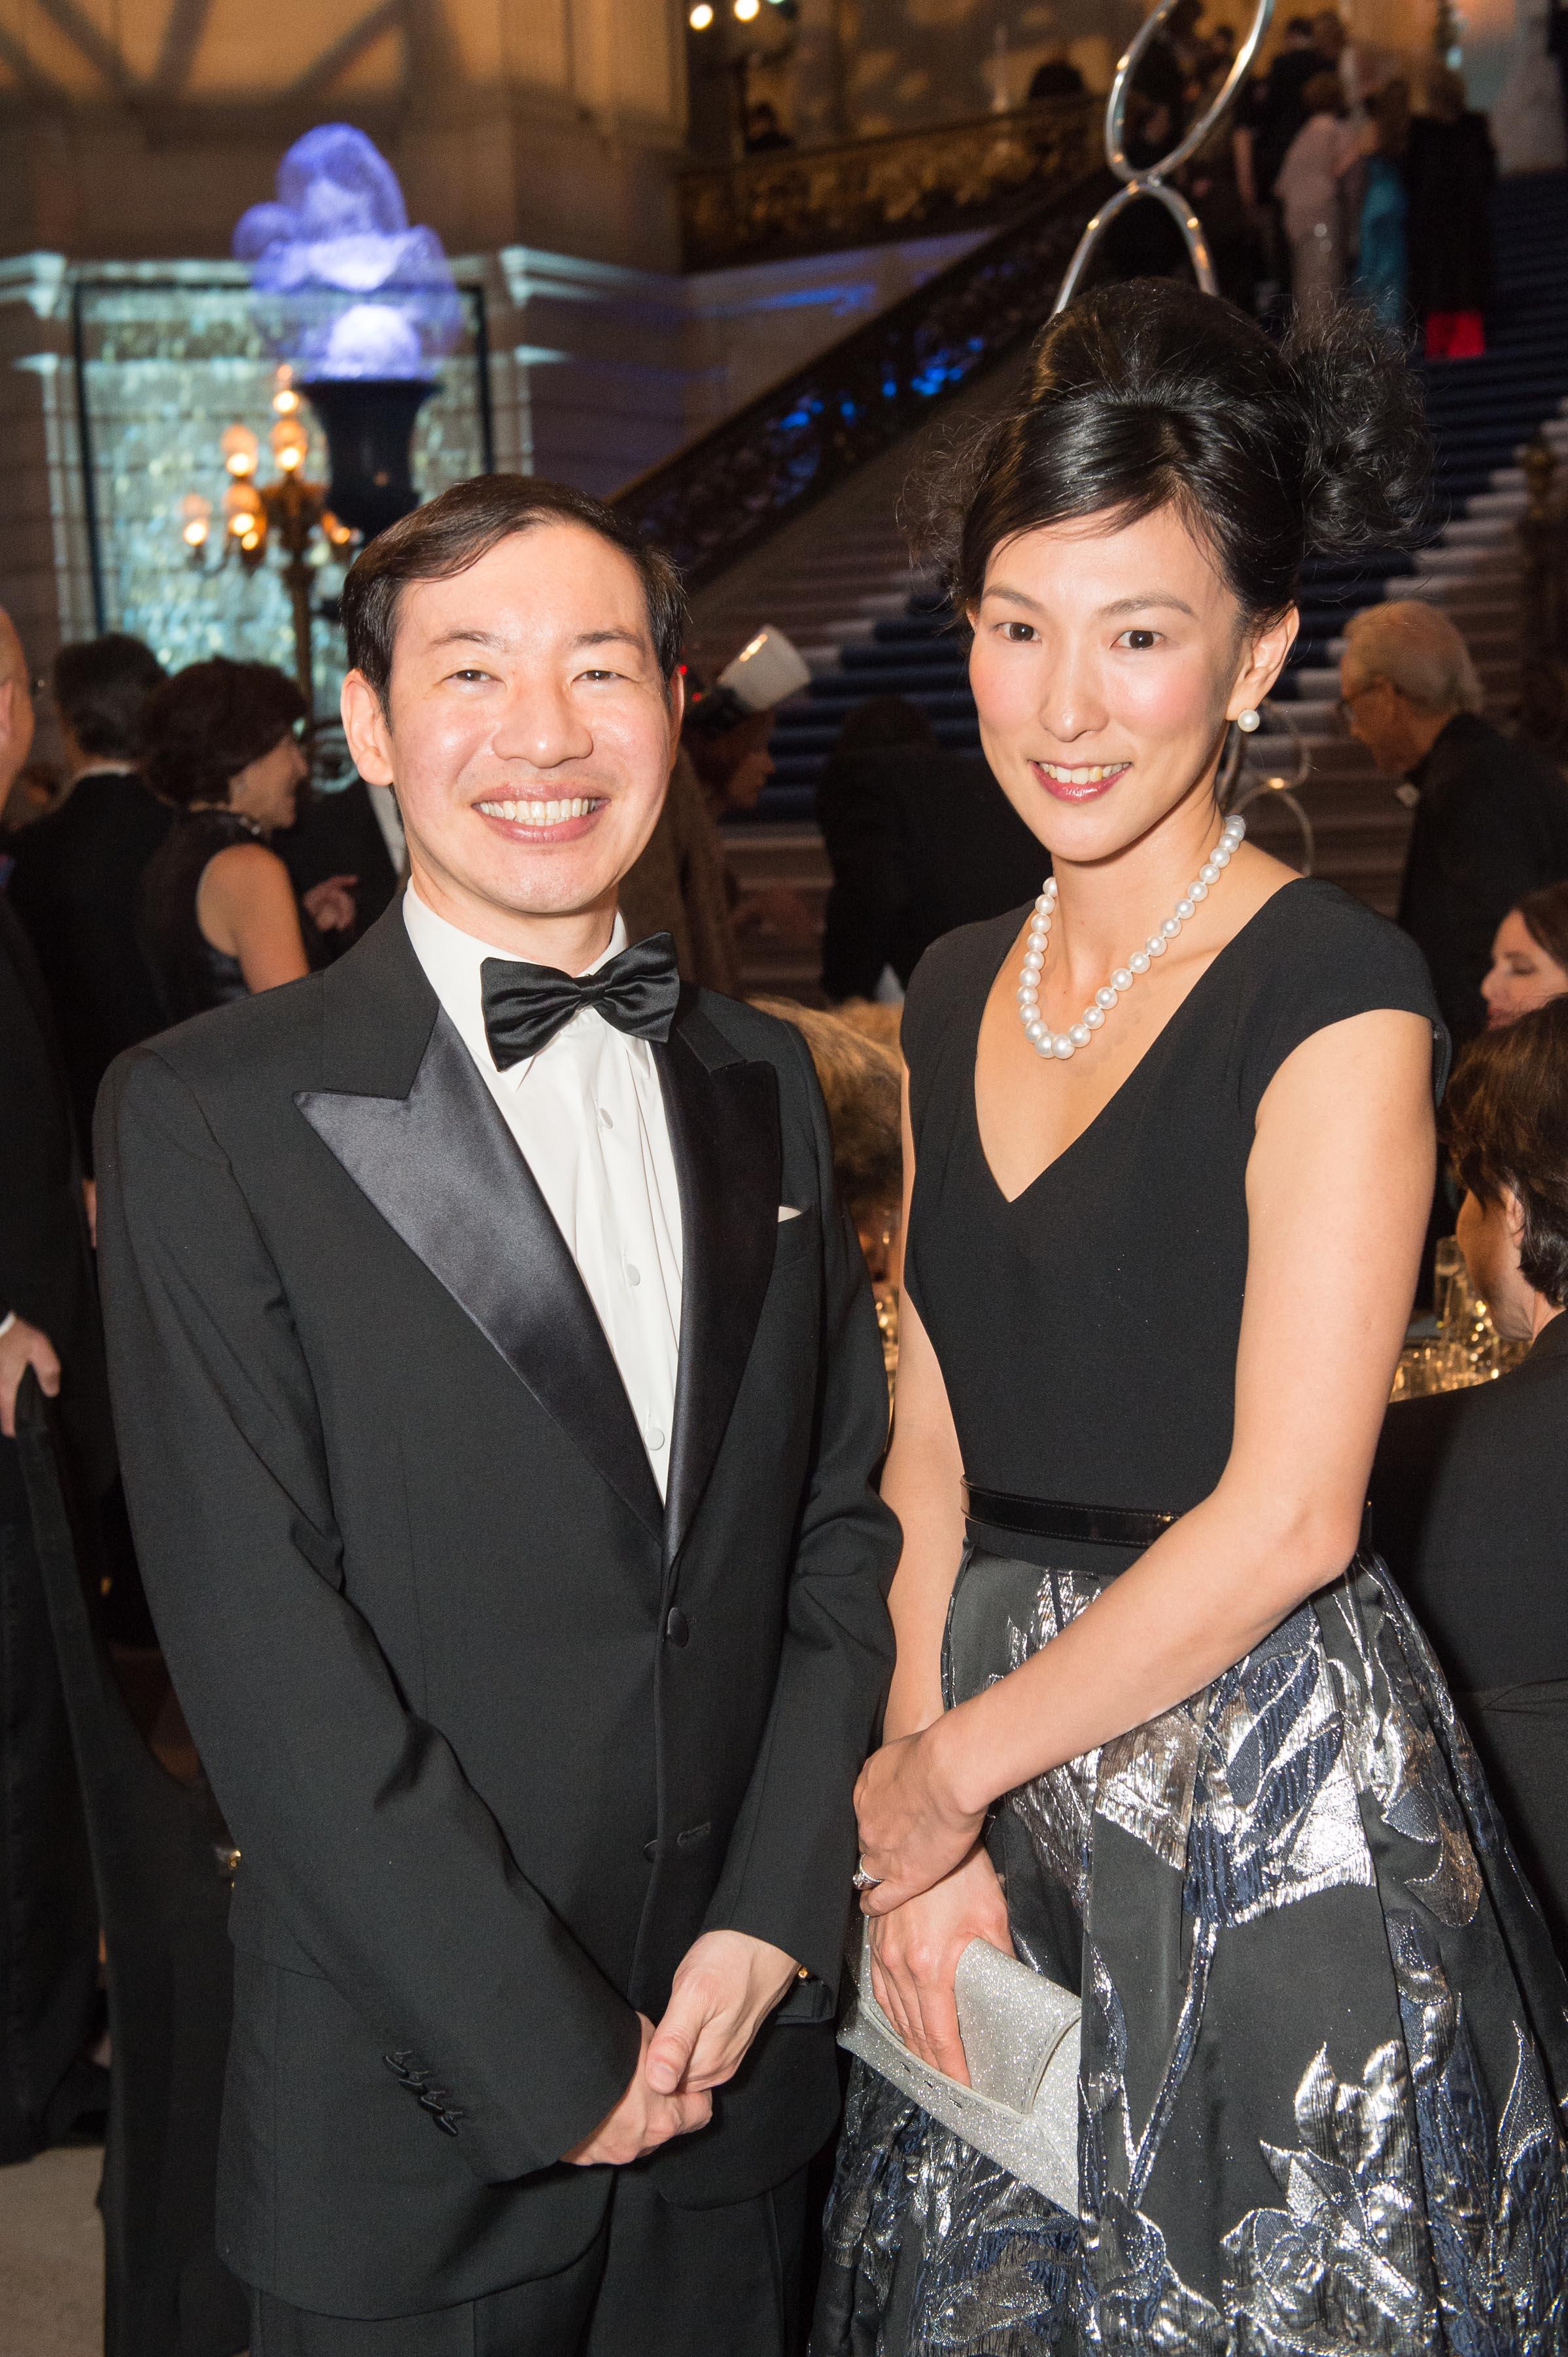 Yasunobu Kyogoku and Reiko Kyogoku. Photo Credit Susana Bates for  Drew Altizer Photography.